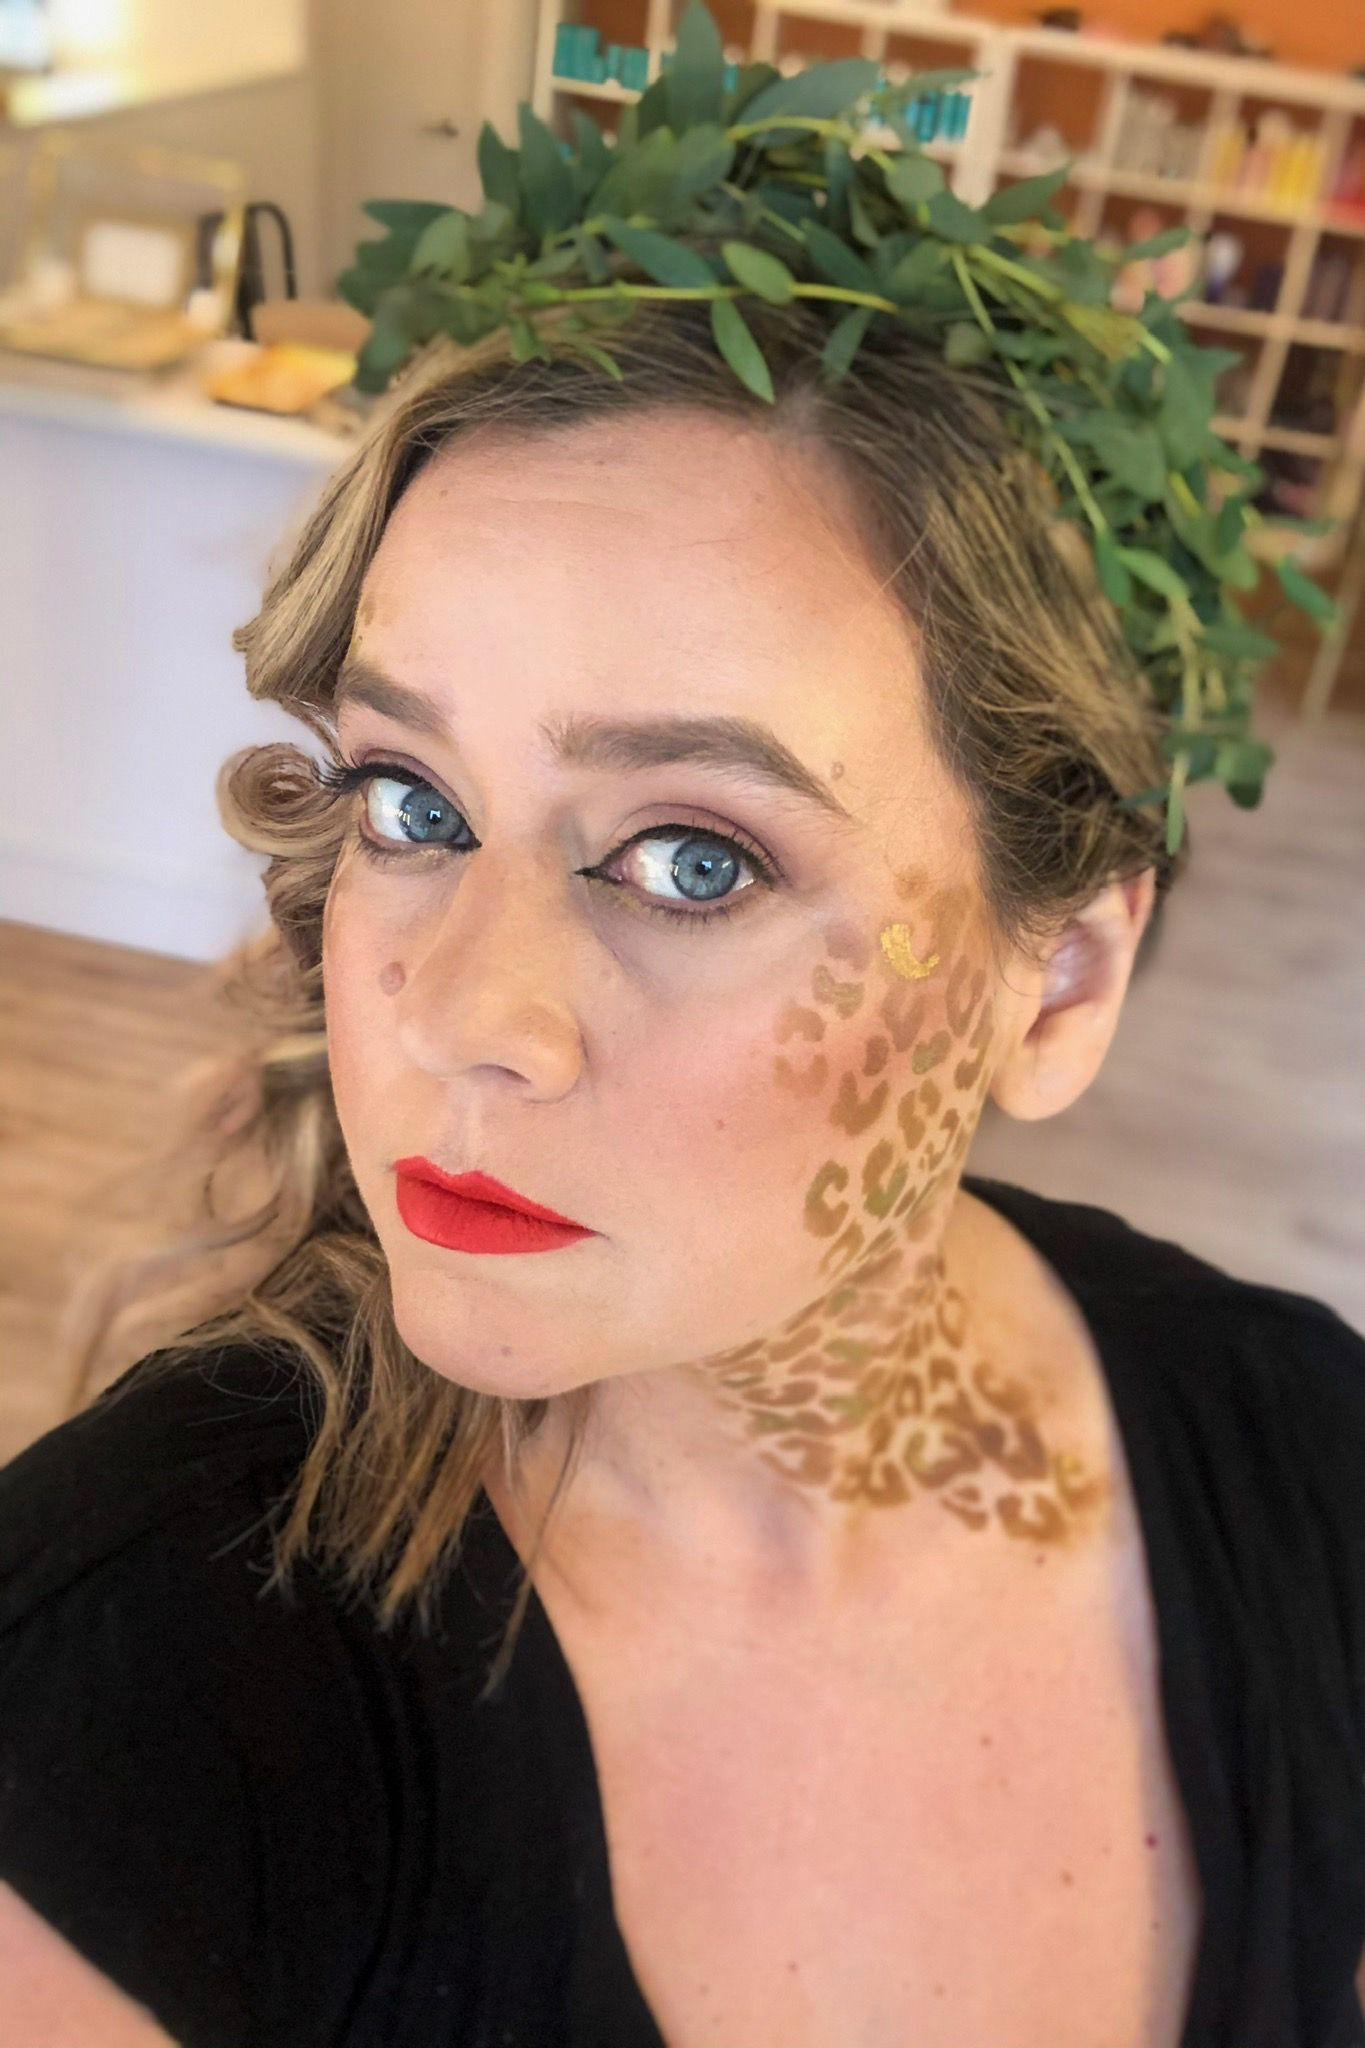 leopard queen makeup idea for Halloween hairstyle